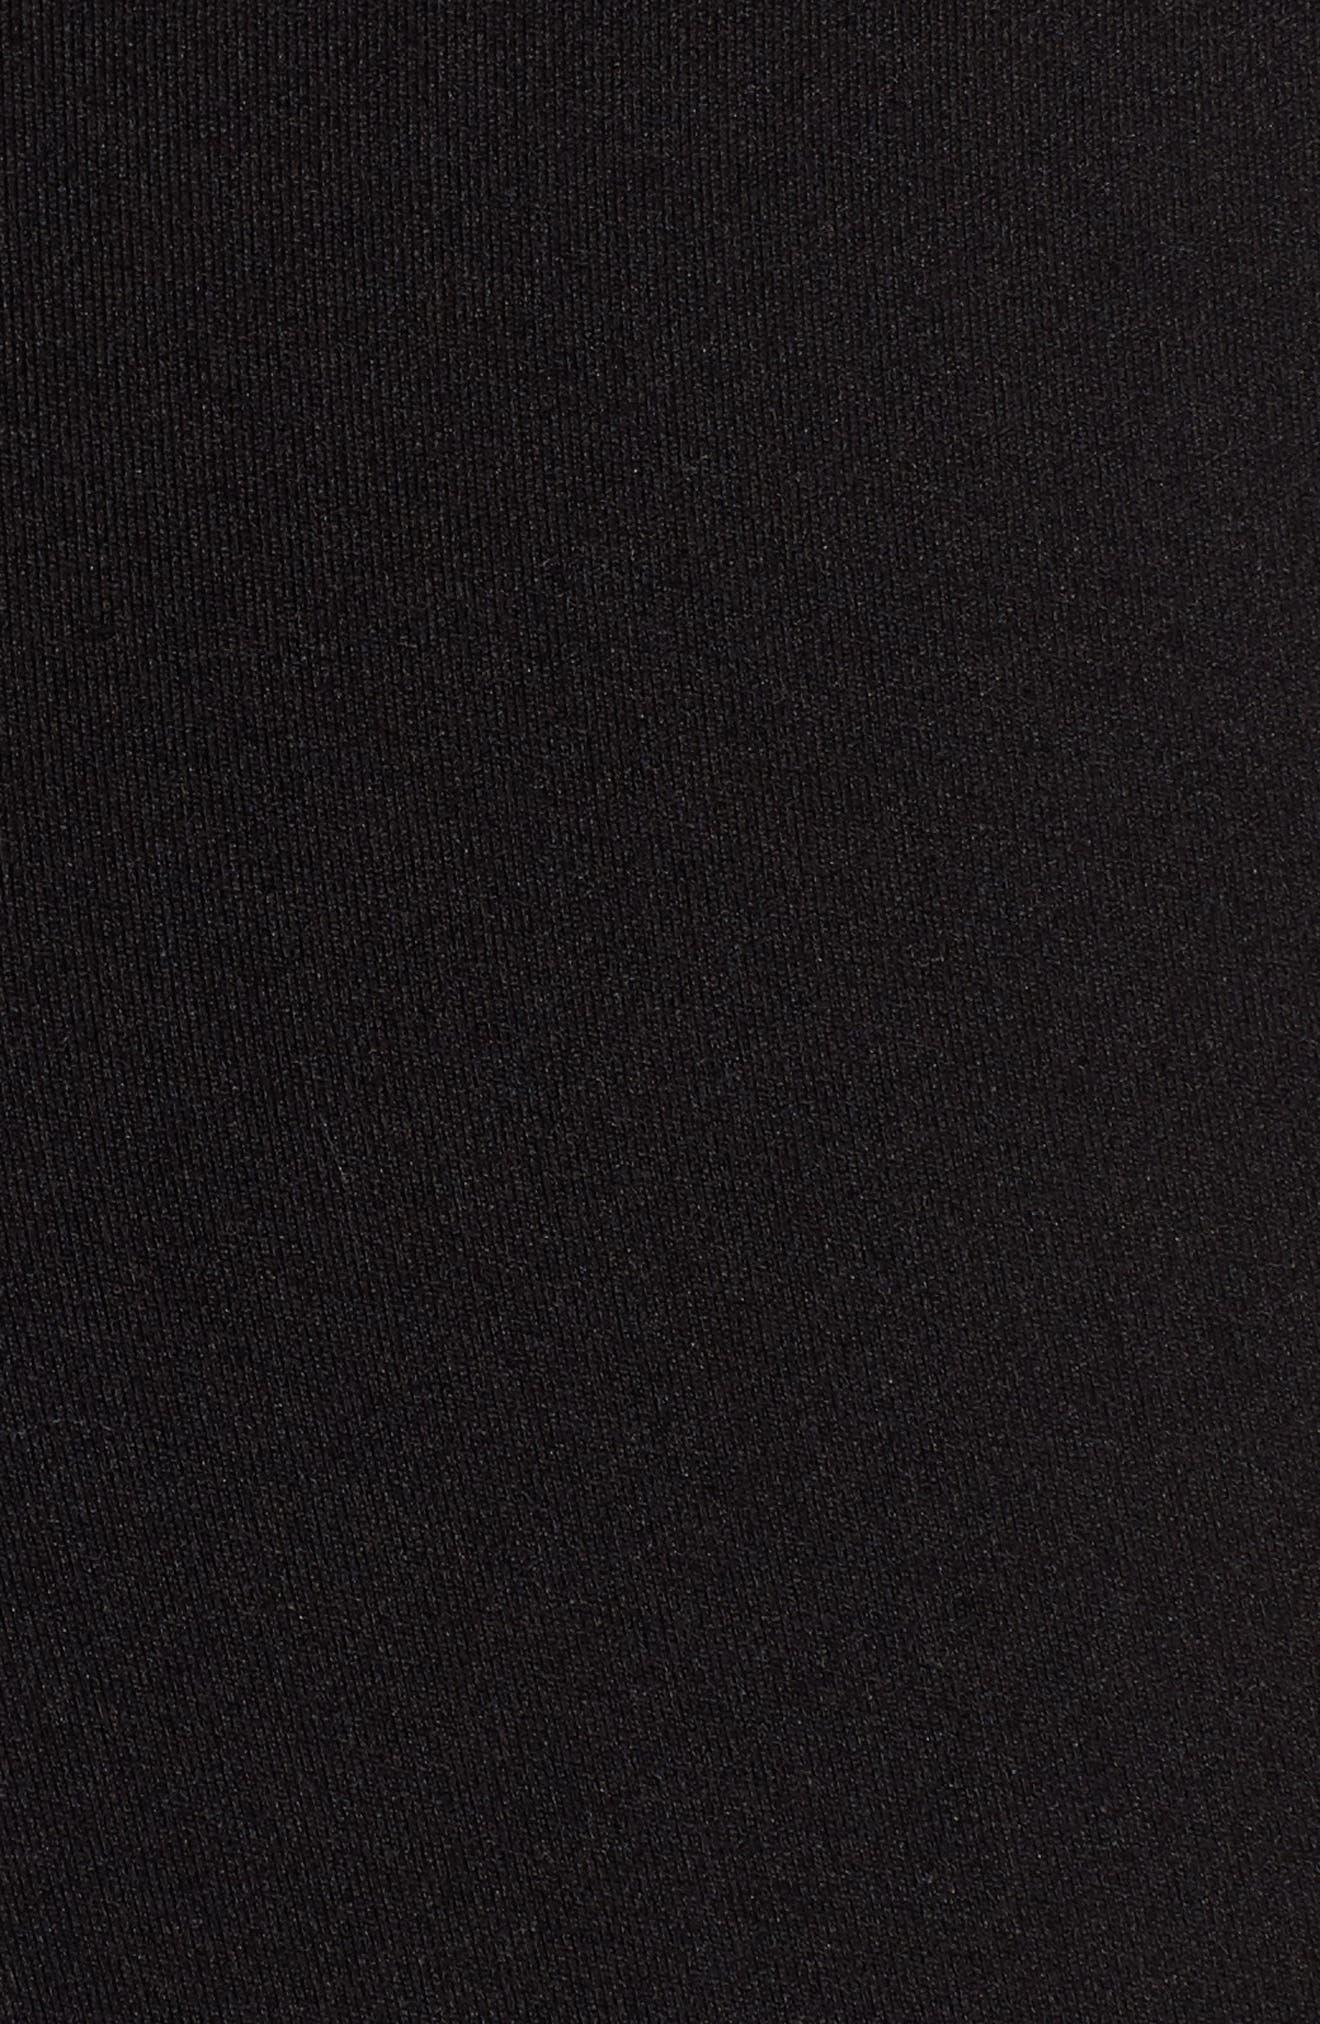 Exposed Zip Knit Pants,                             Alternate thumbnail 5, color,                             001